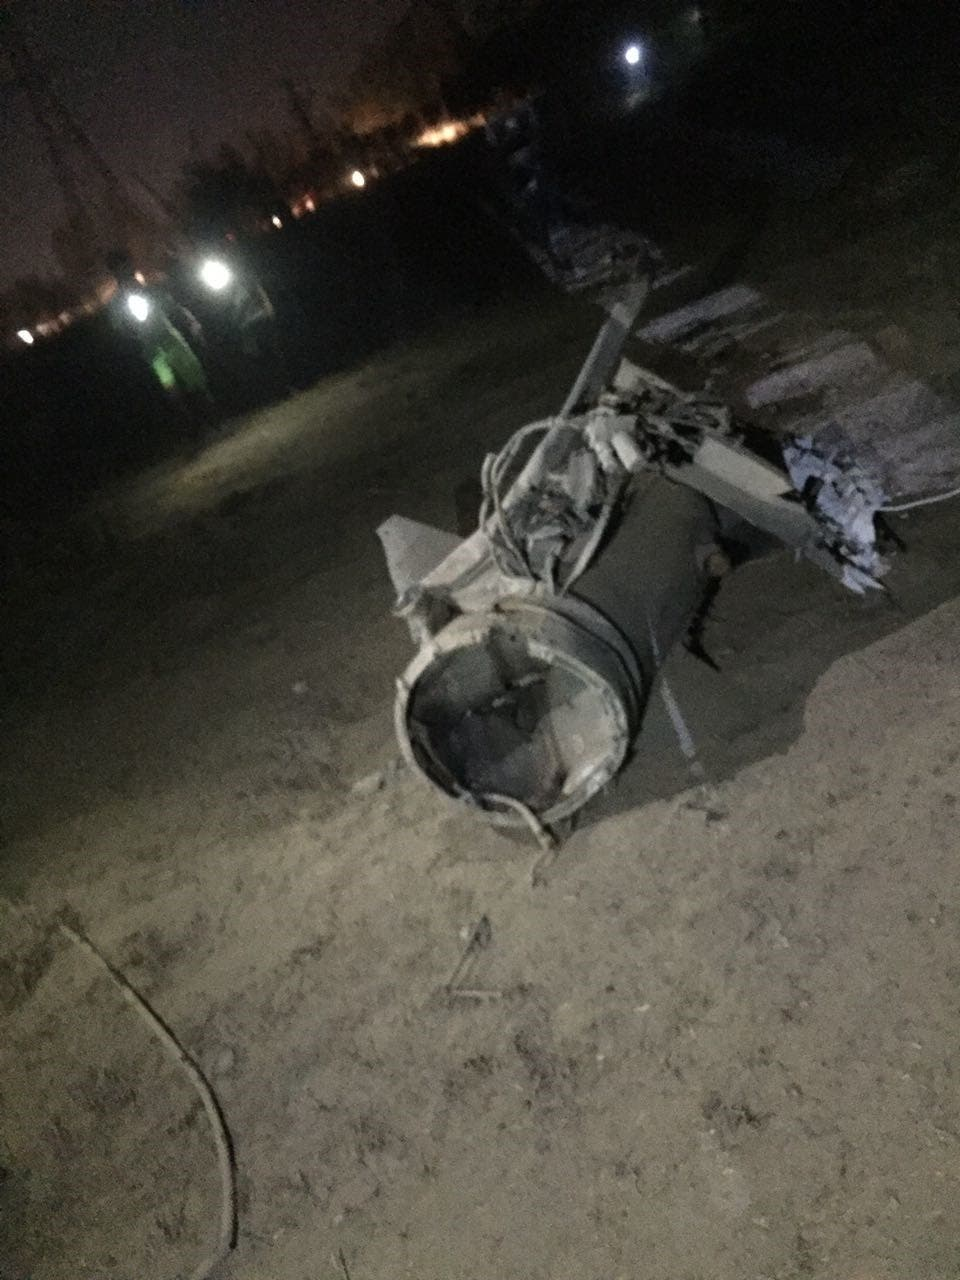 missiles al arabiya